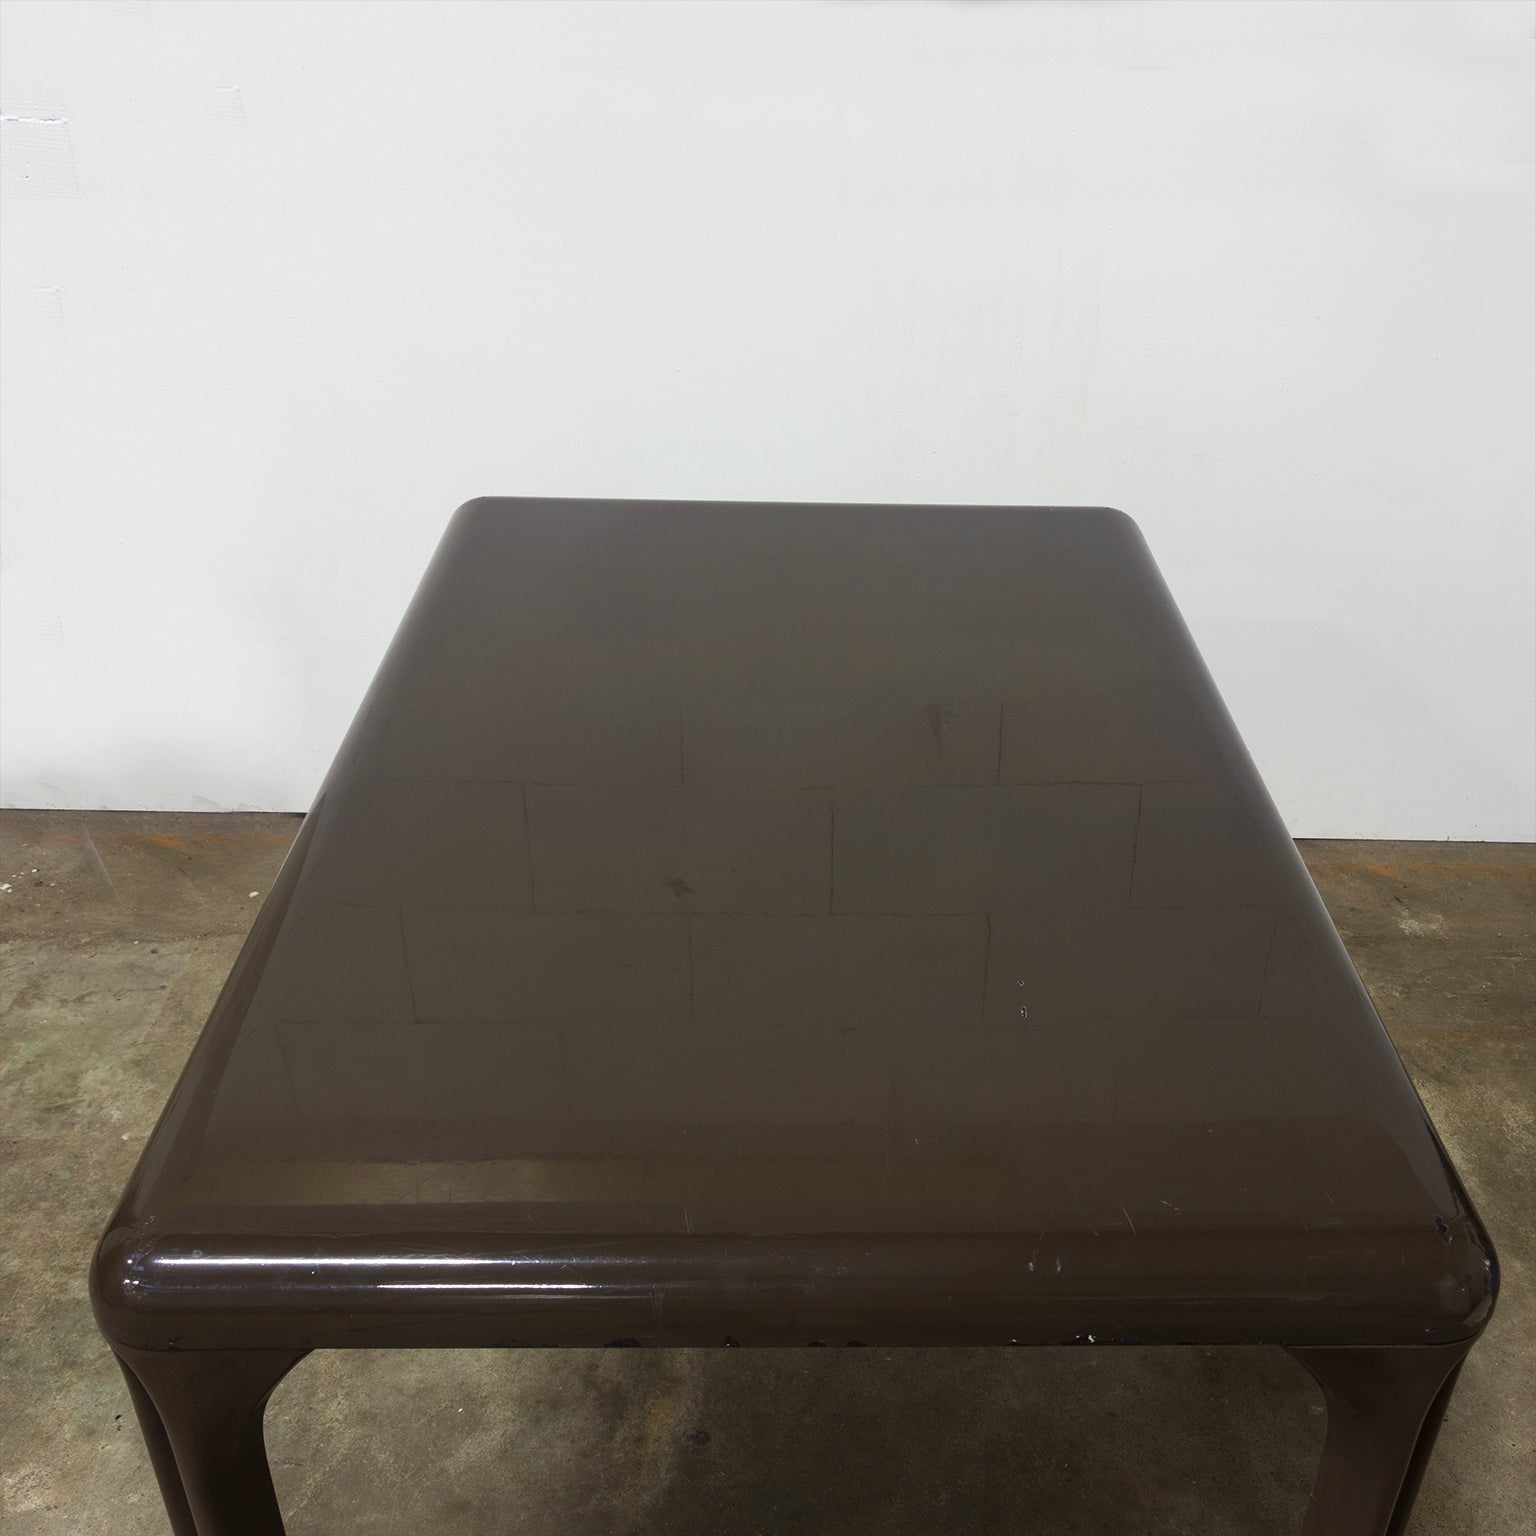 Bruine Side Table.1969 Vico Magistretti For Artemide Brown Plastic To Dissamble Table